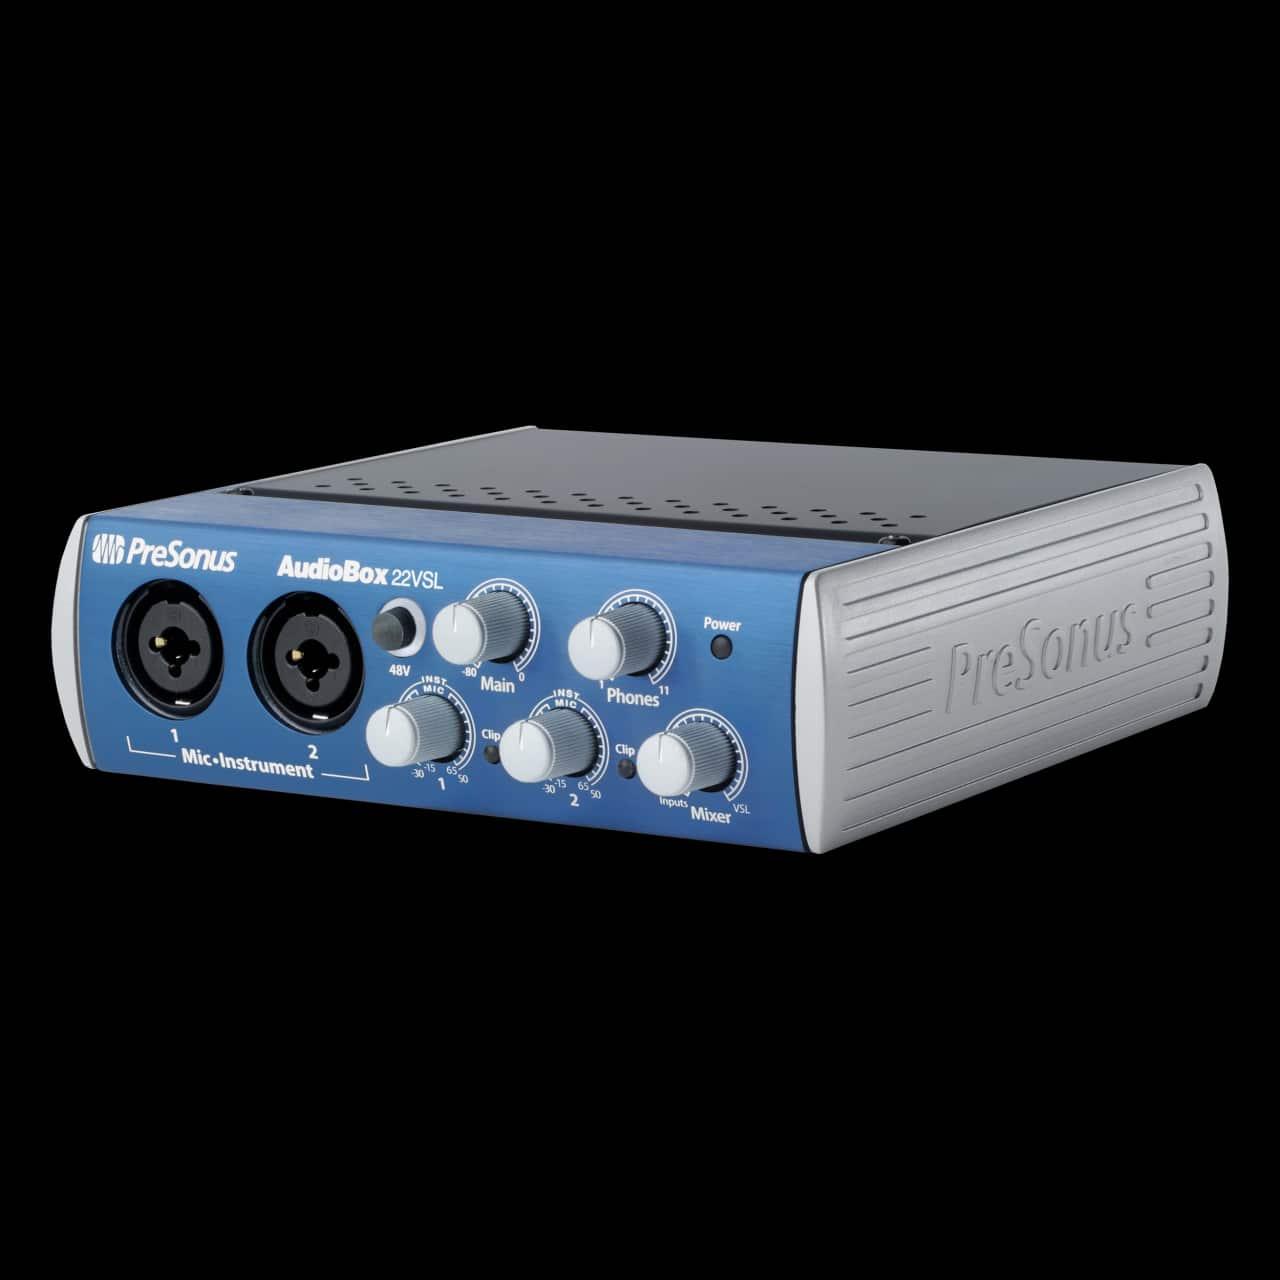 presonus audiobox 22vsl audio box usb 2 0 computer recording reverb. Black Bedroom Furniture Sets. Home Design Ideas